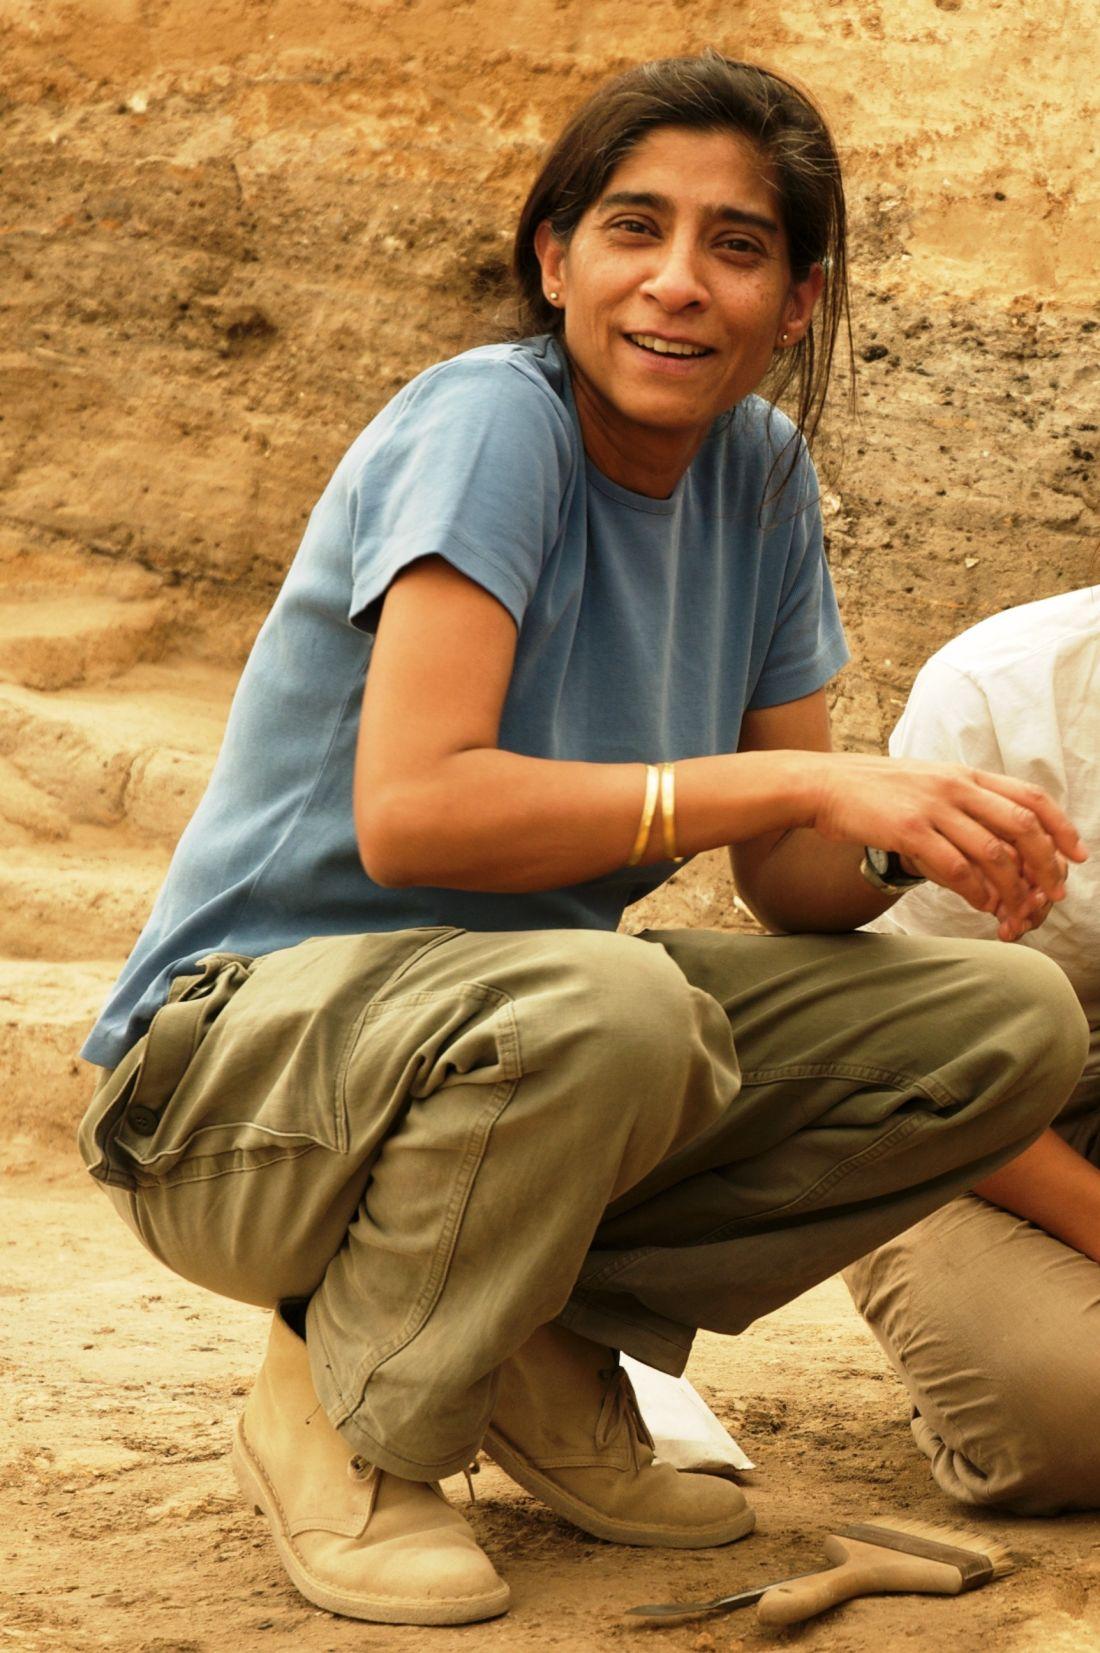 Shahina Farid during excavations